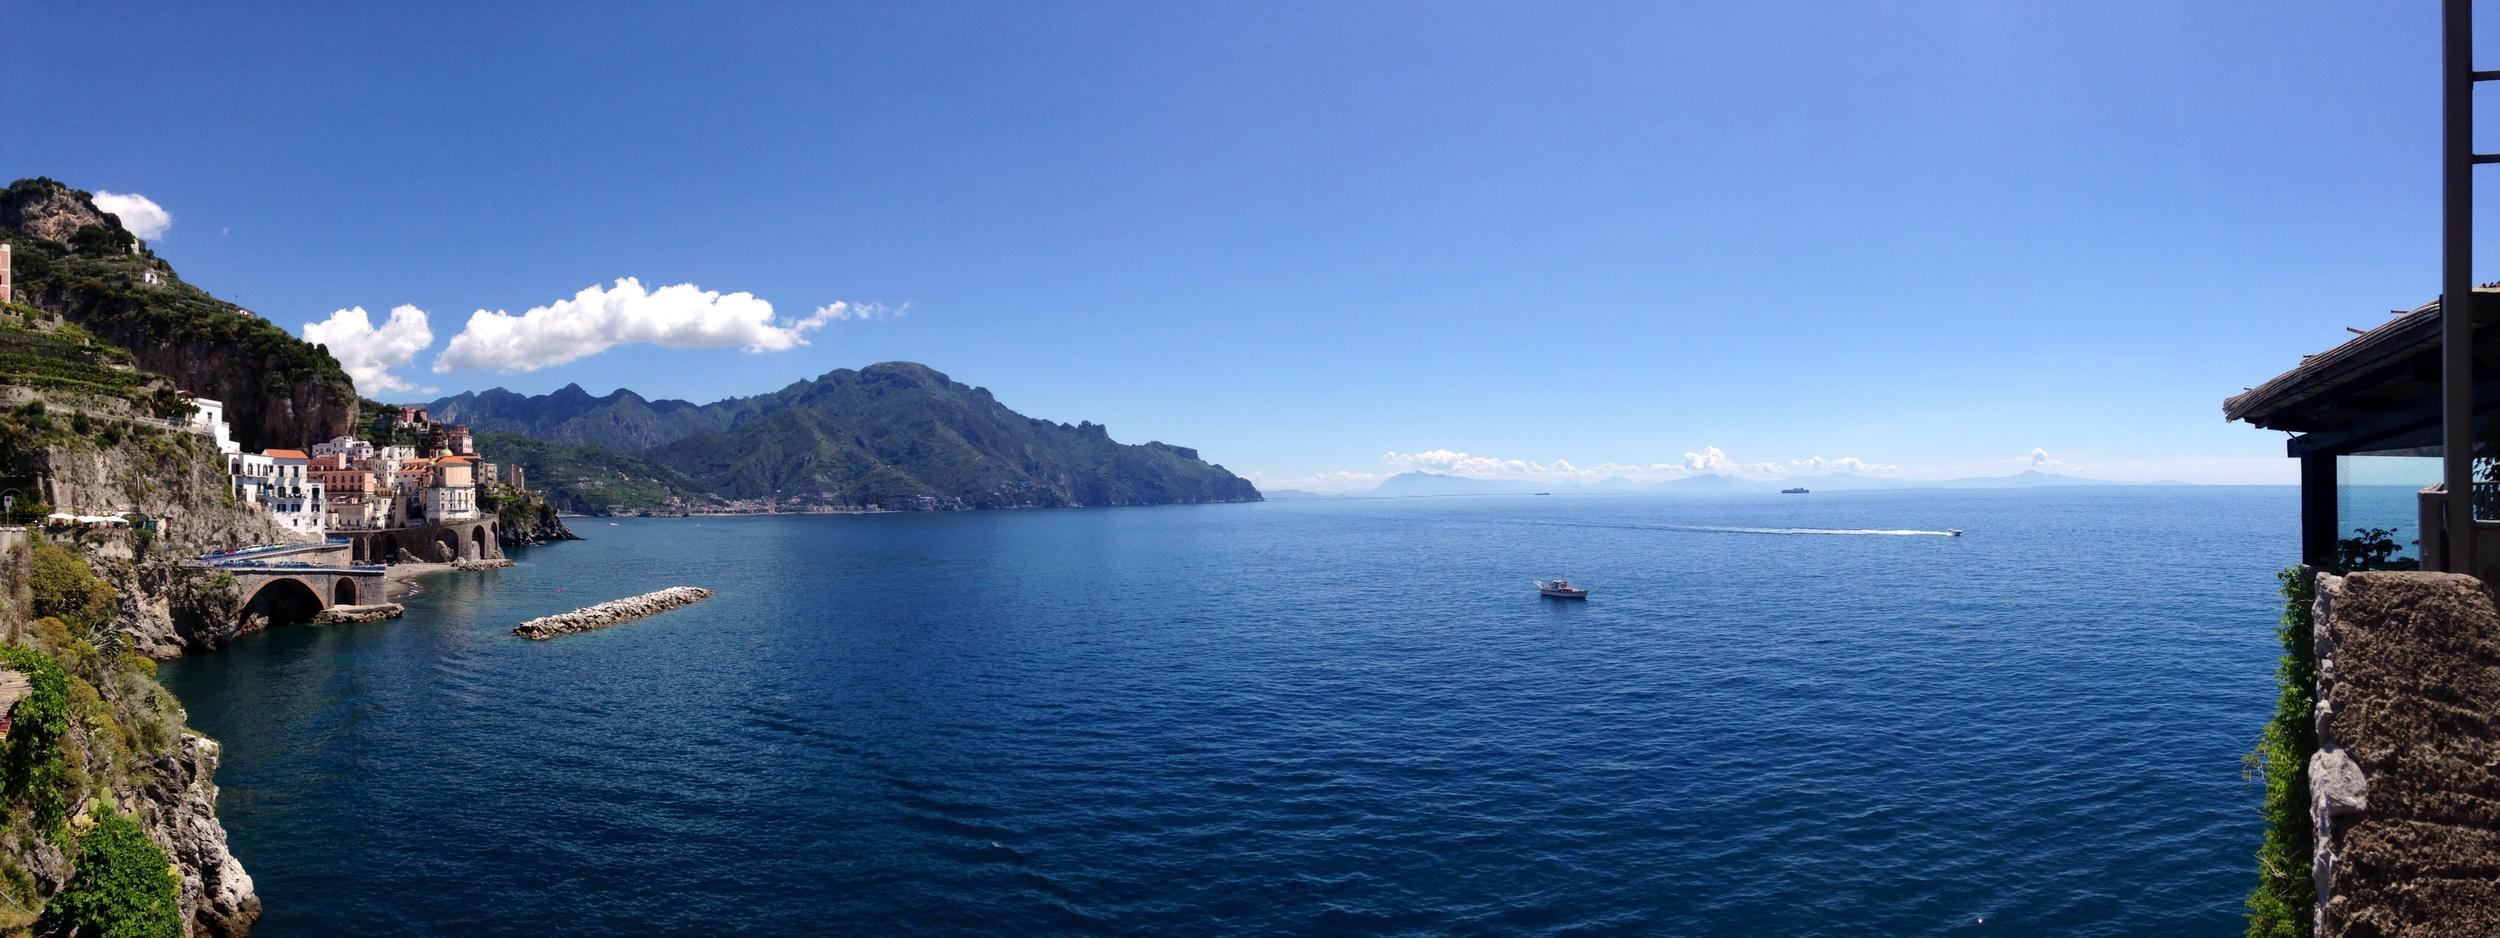 A look done the Amalfi Coast.